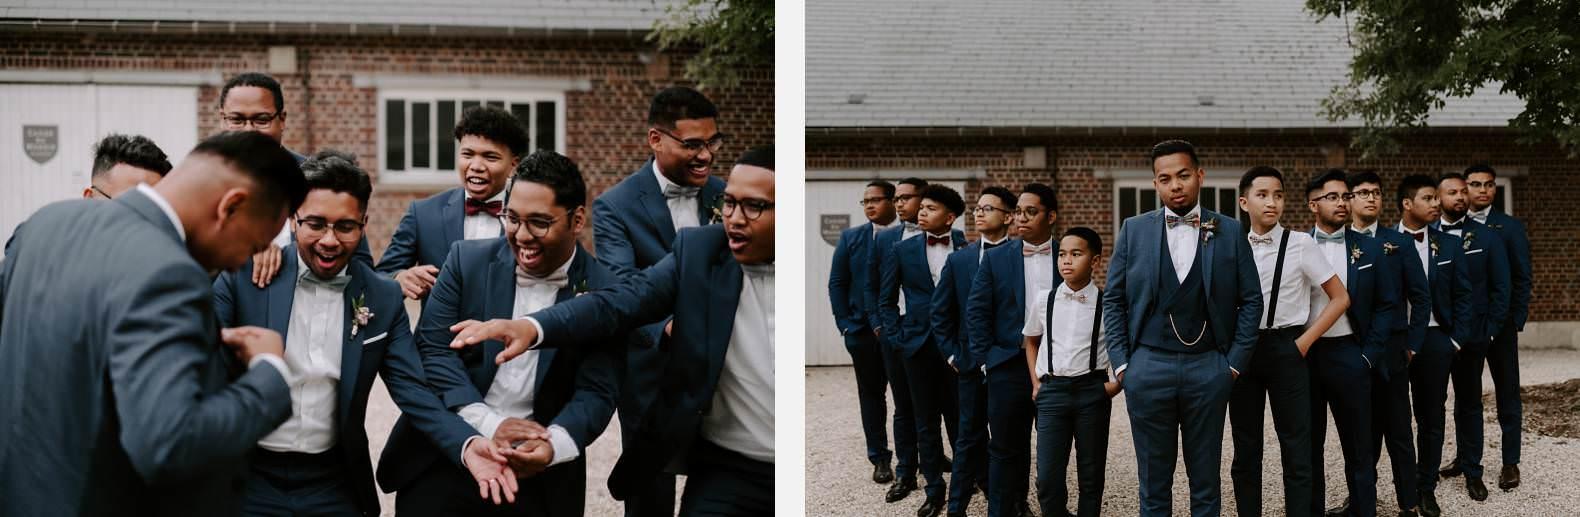 mariage manoir de corny photographe bel esprit 0053 1